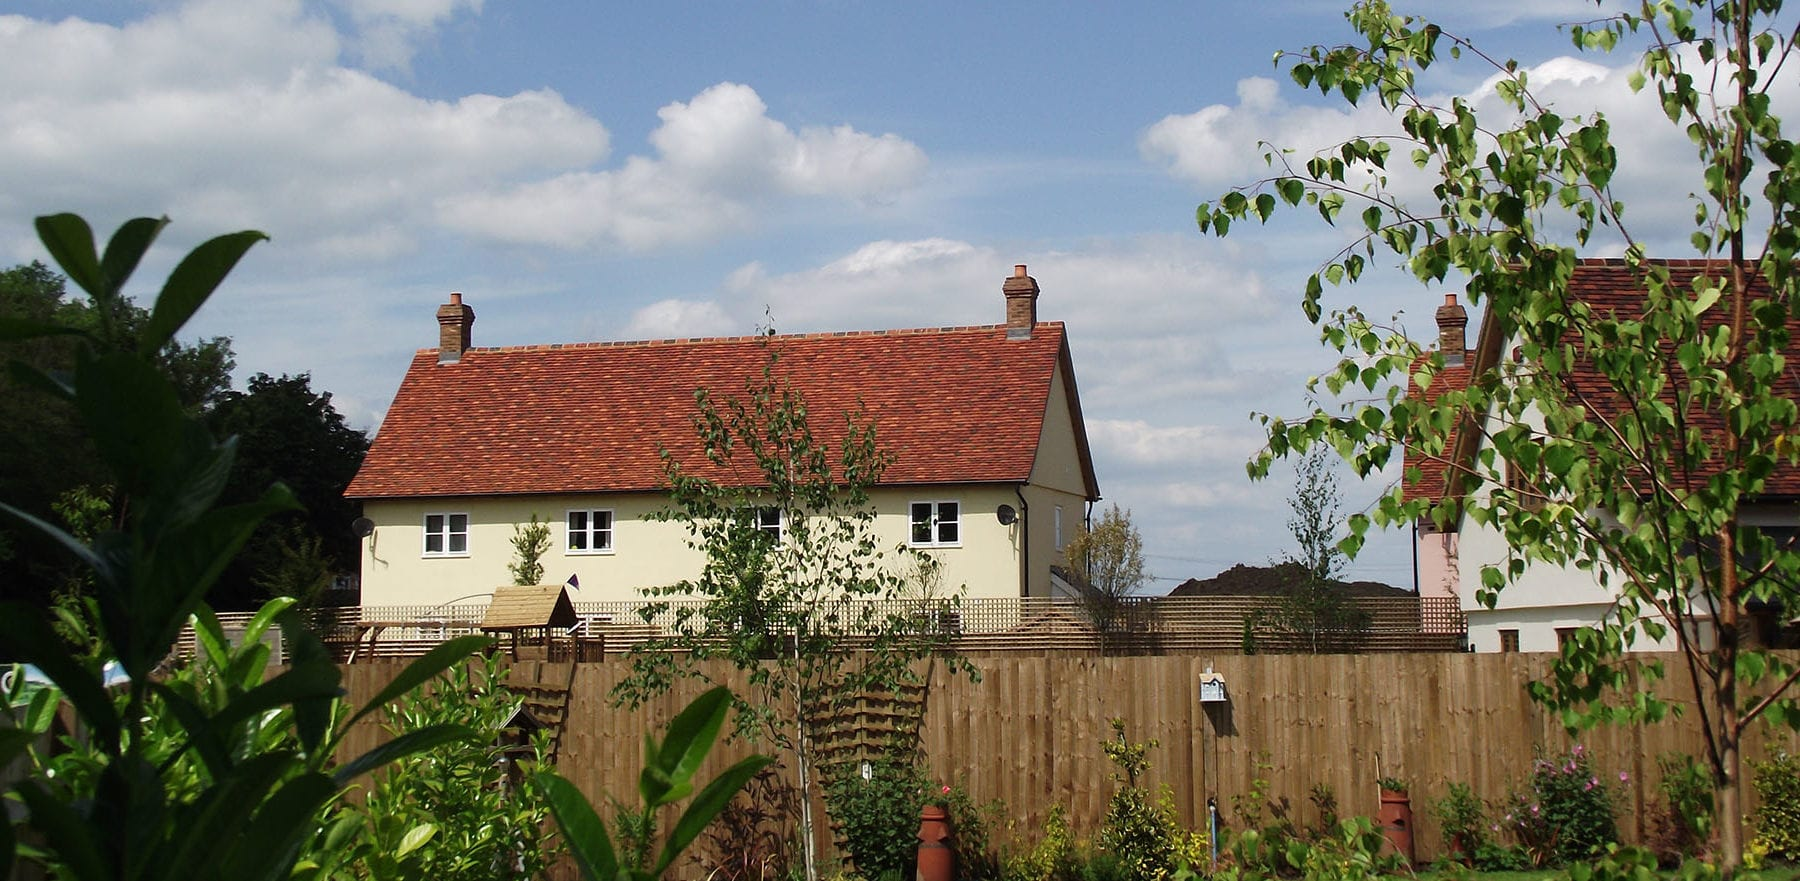 Lifestiles - Handmade Multi Clay Roof Tiles - Manuden, England 4